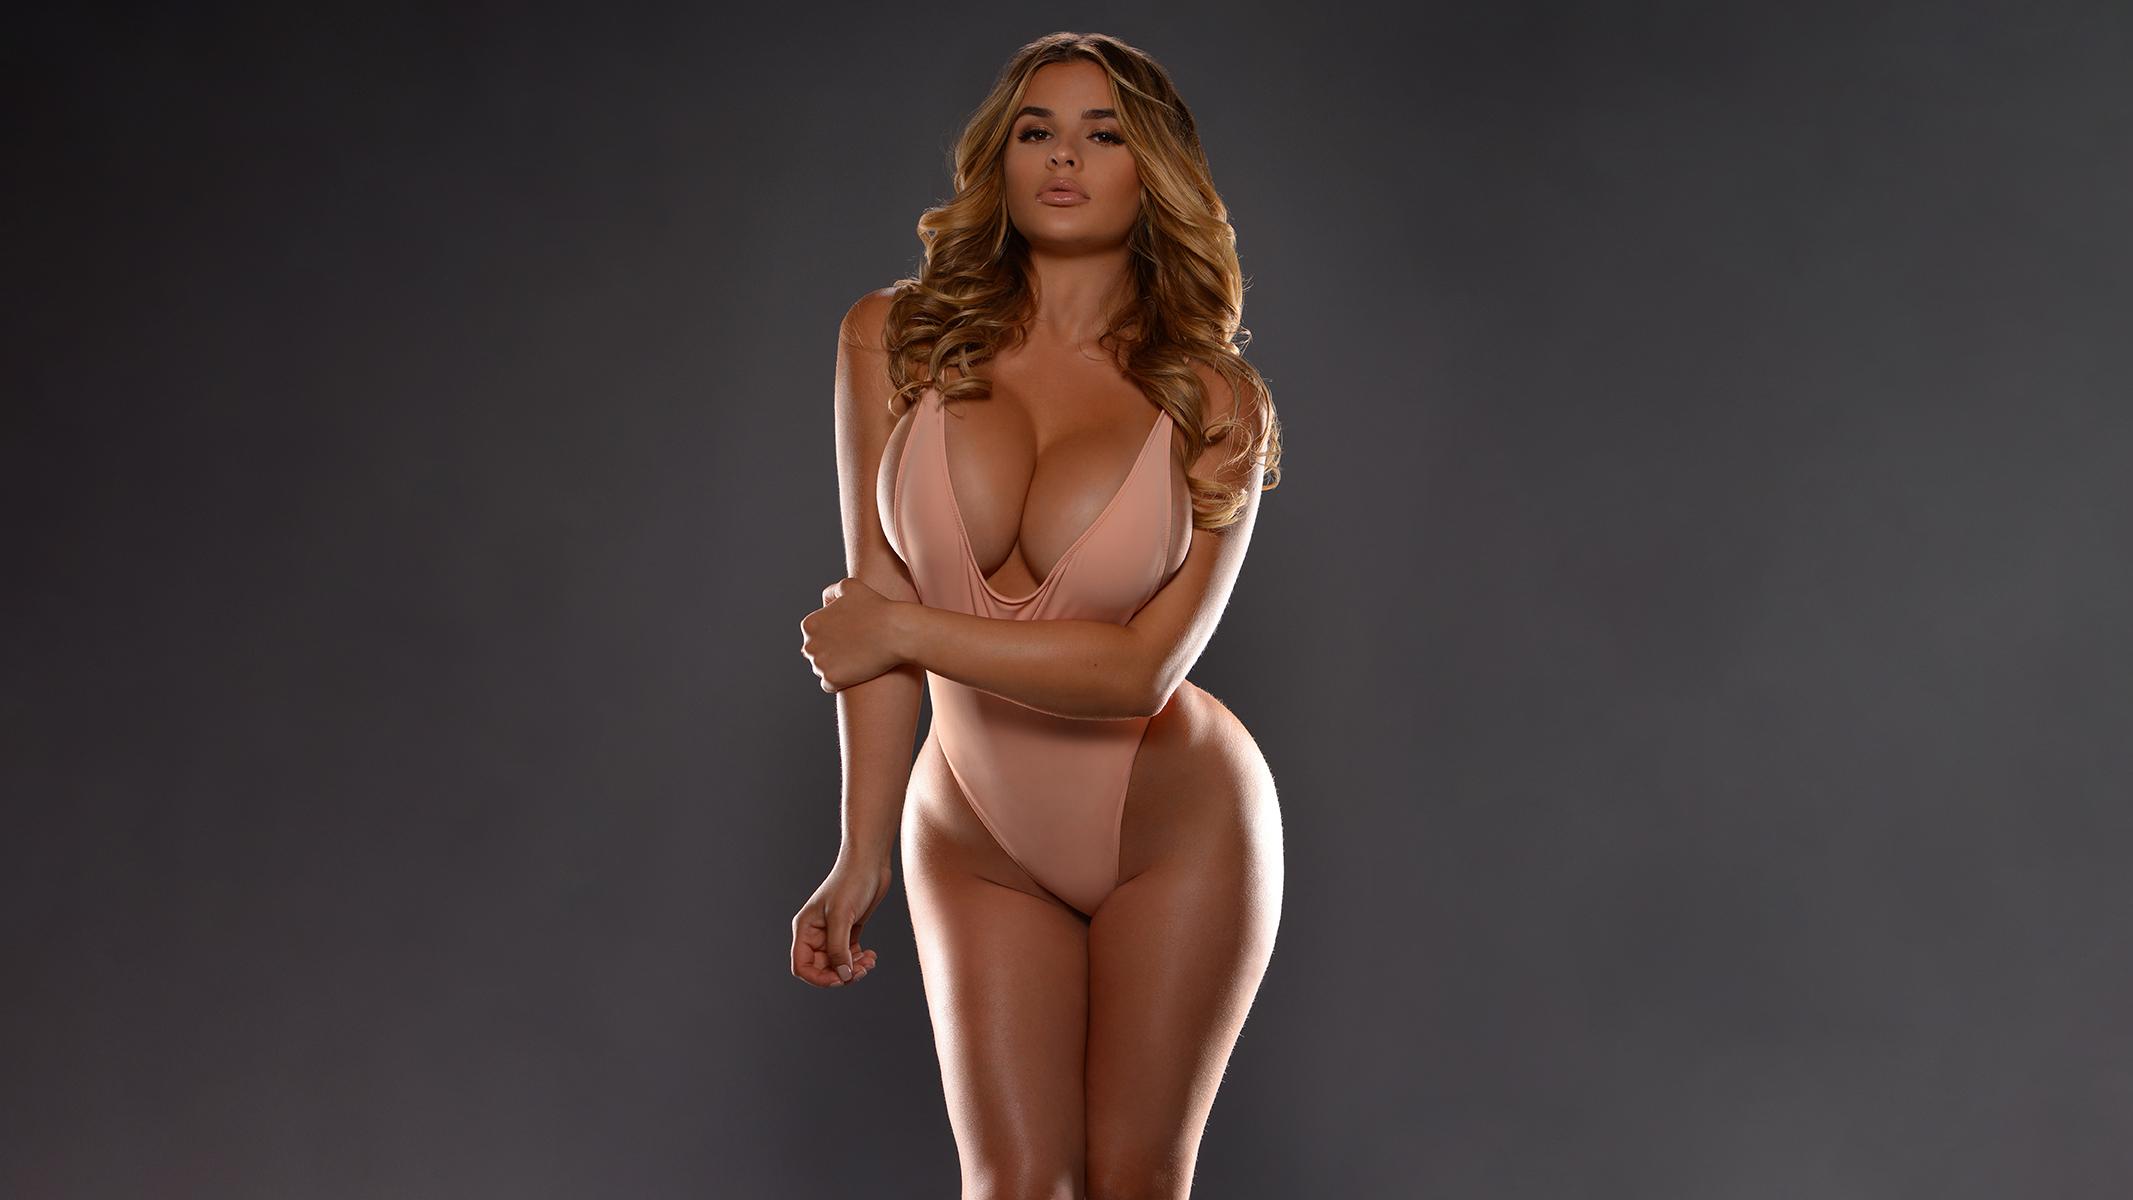 Courtney stodden bares her boobs in a tiny lettuce bikini